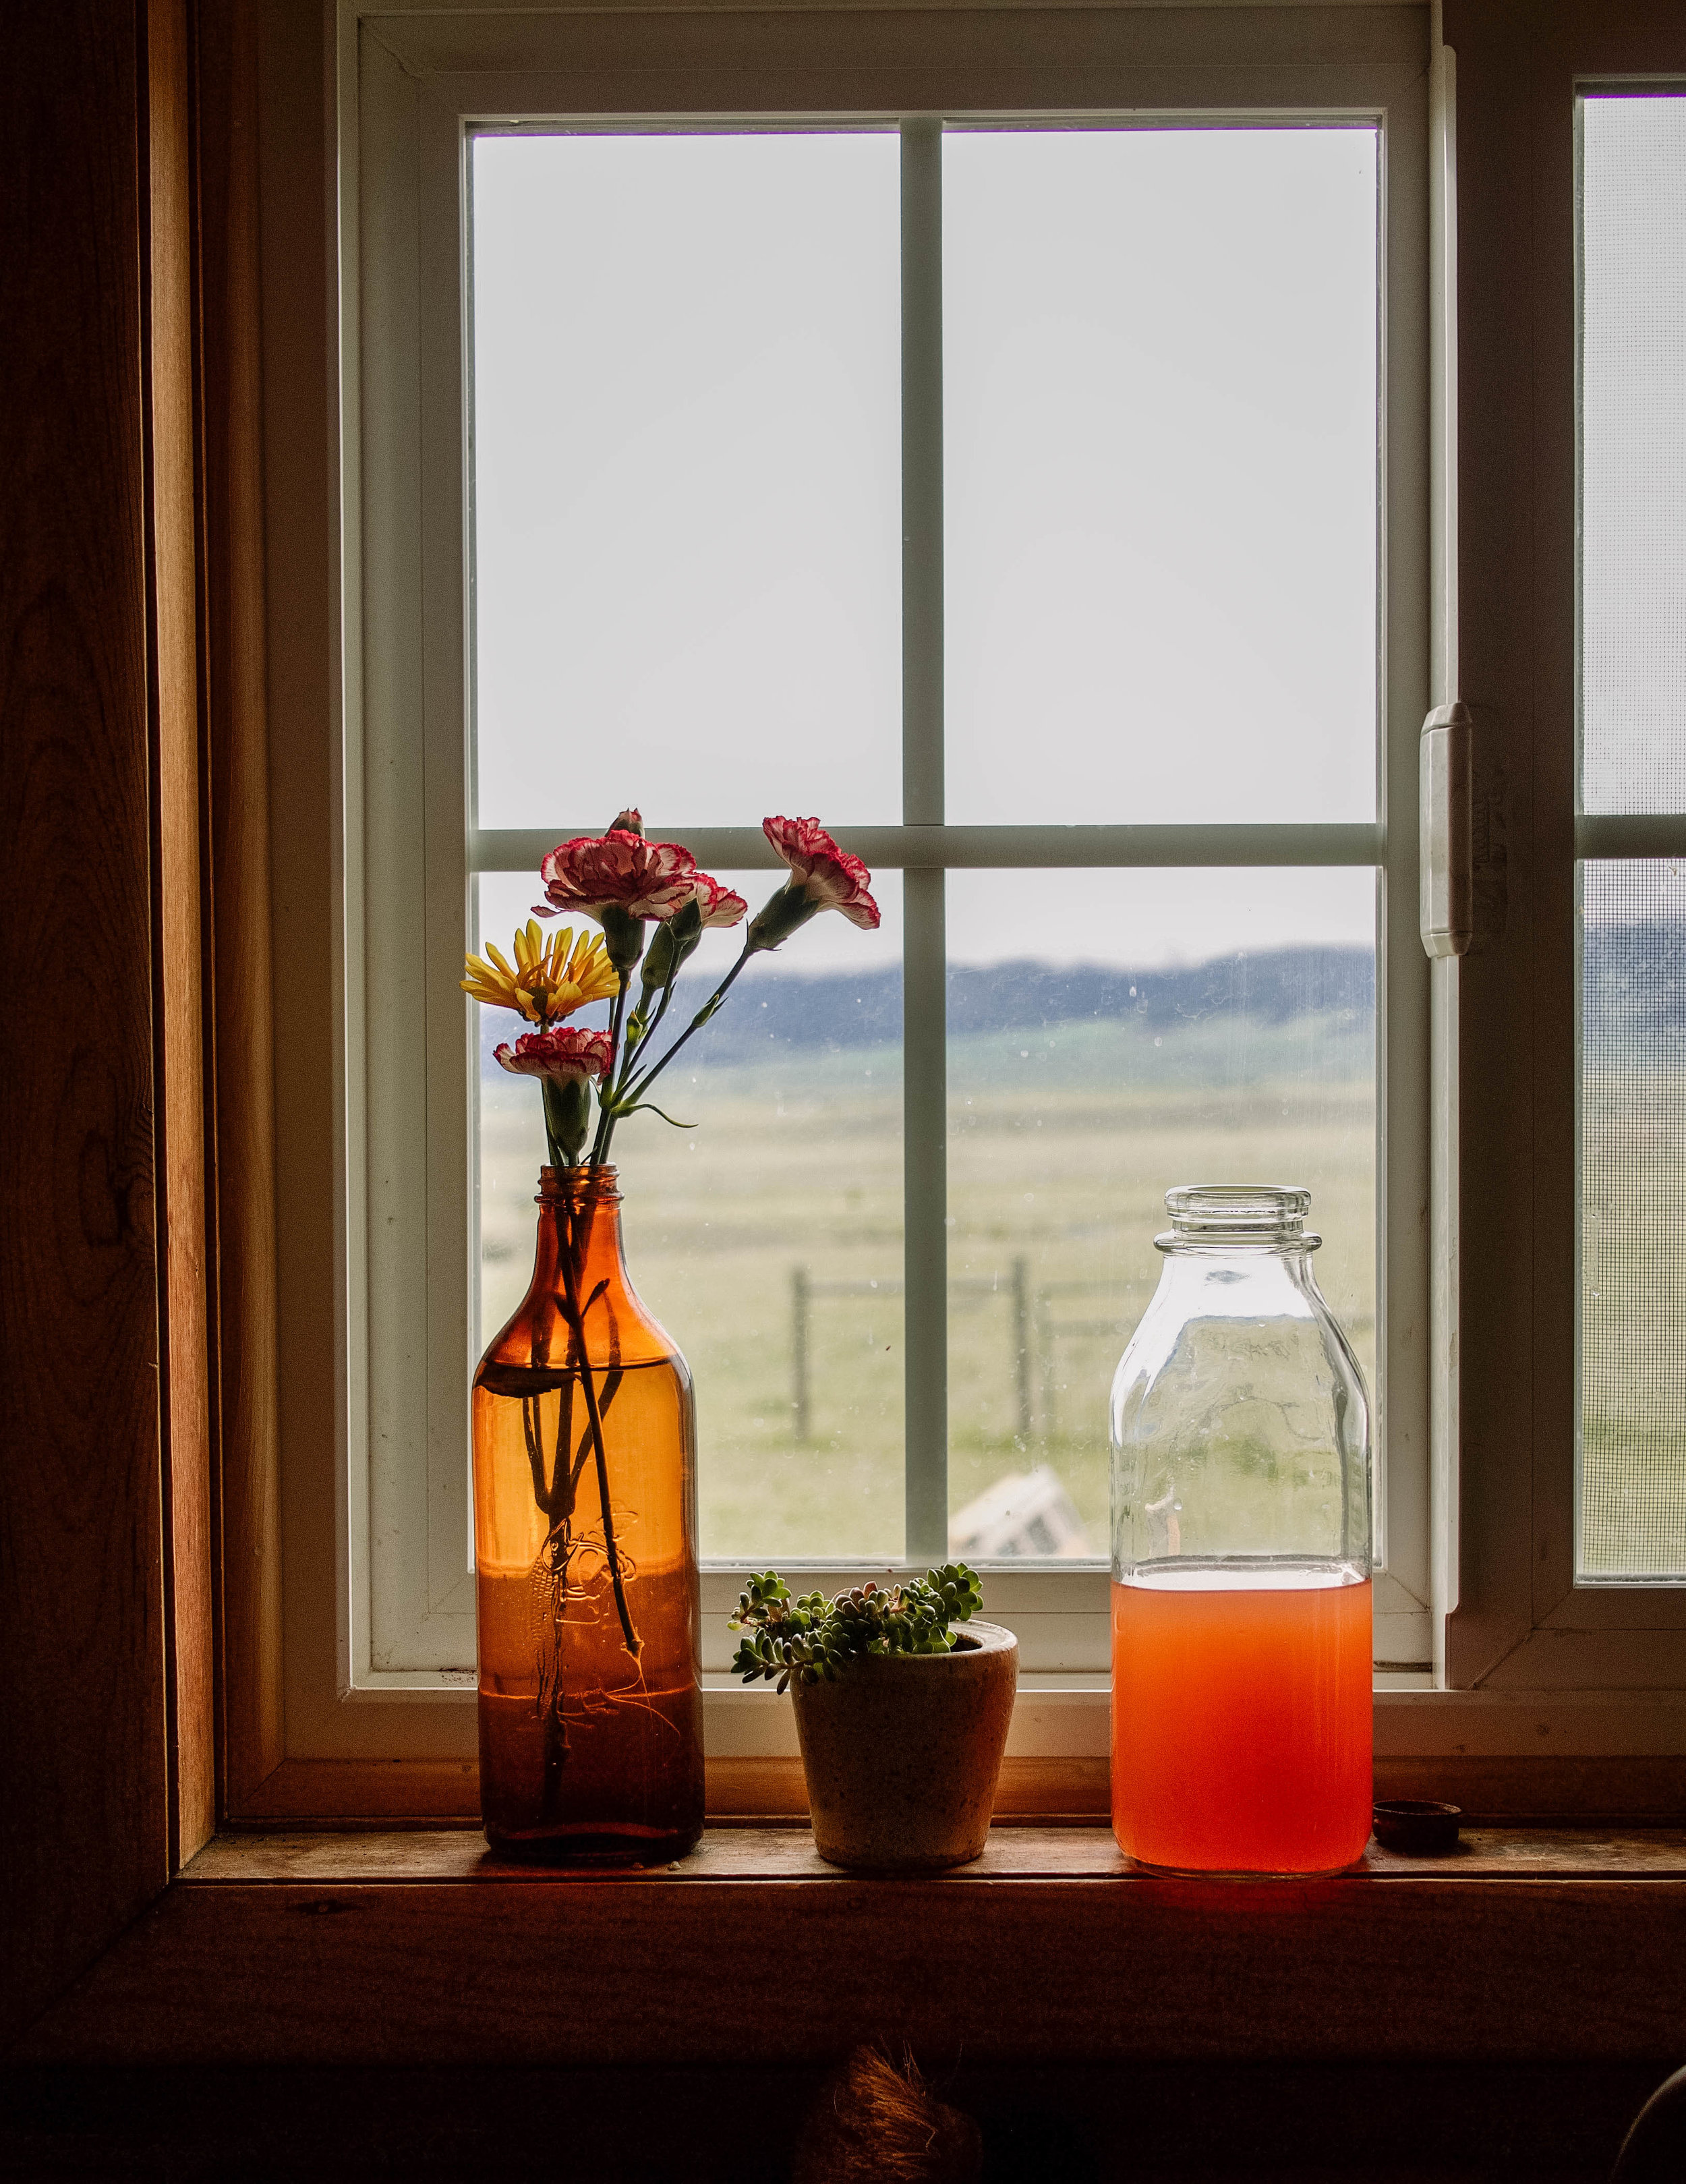 rhubarb shurb in a kitchen window